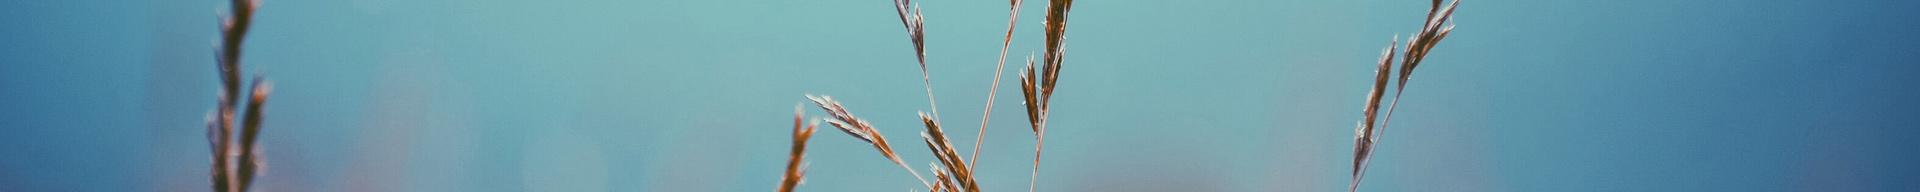 wheat grass against blue sky